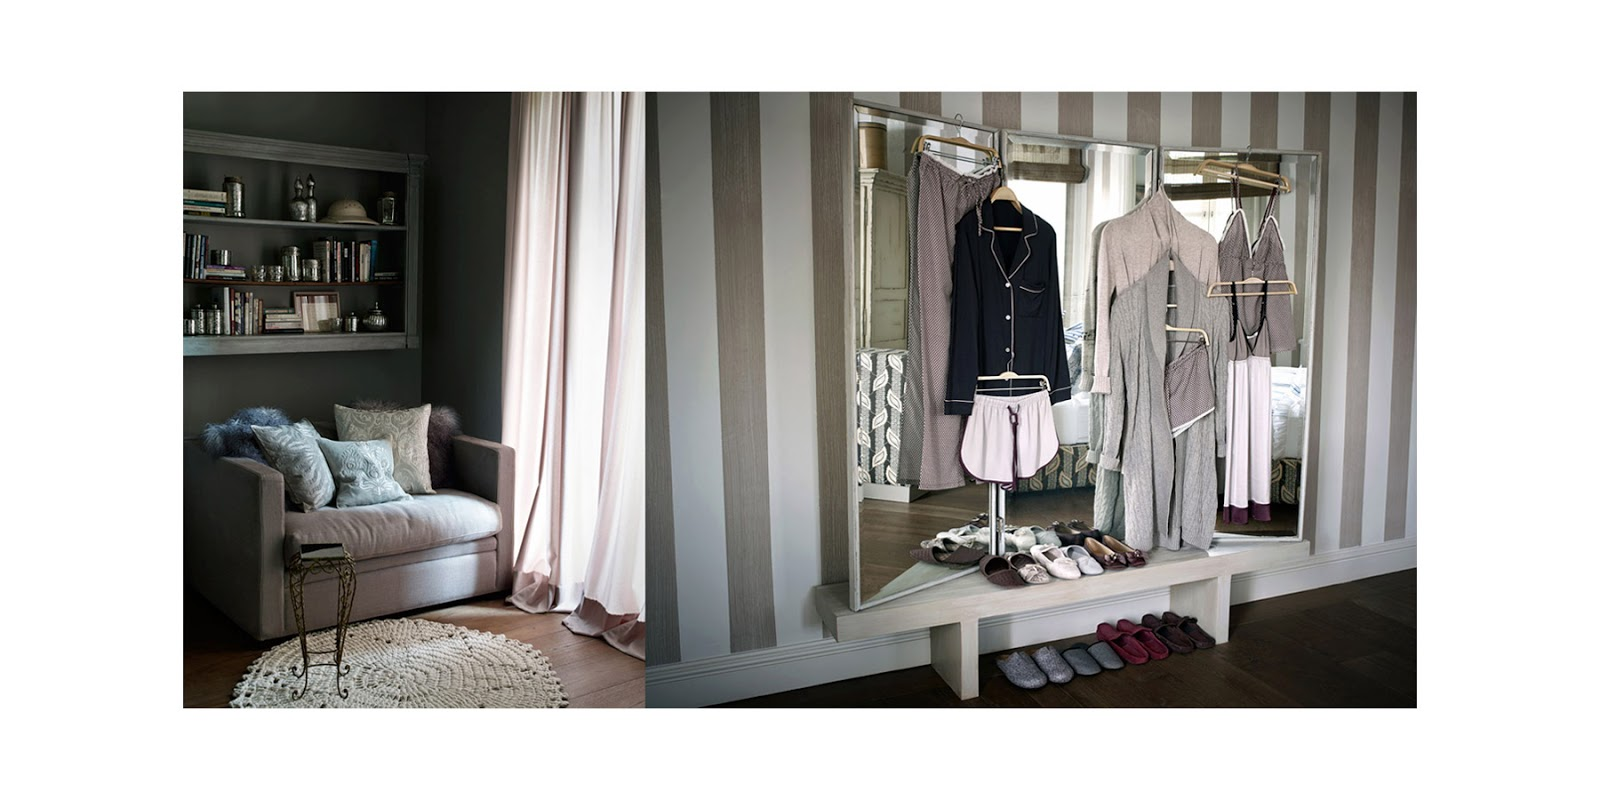 jildou bijsterbosch zara home fall winter 2013 part 1. Black Bedroom Furniture Sets. Home Design Ideas